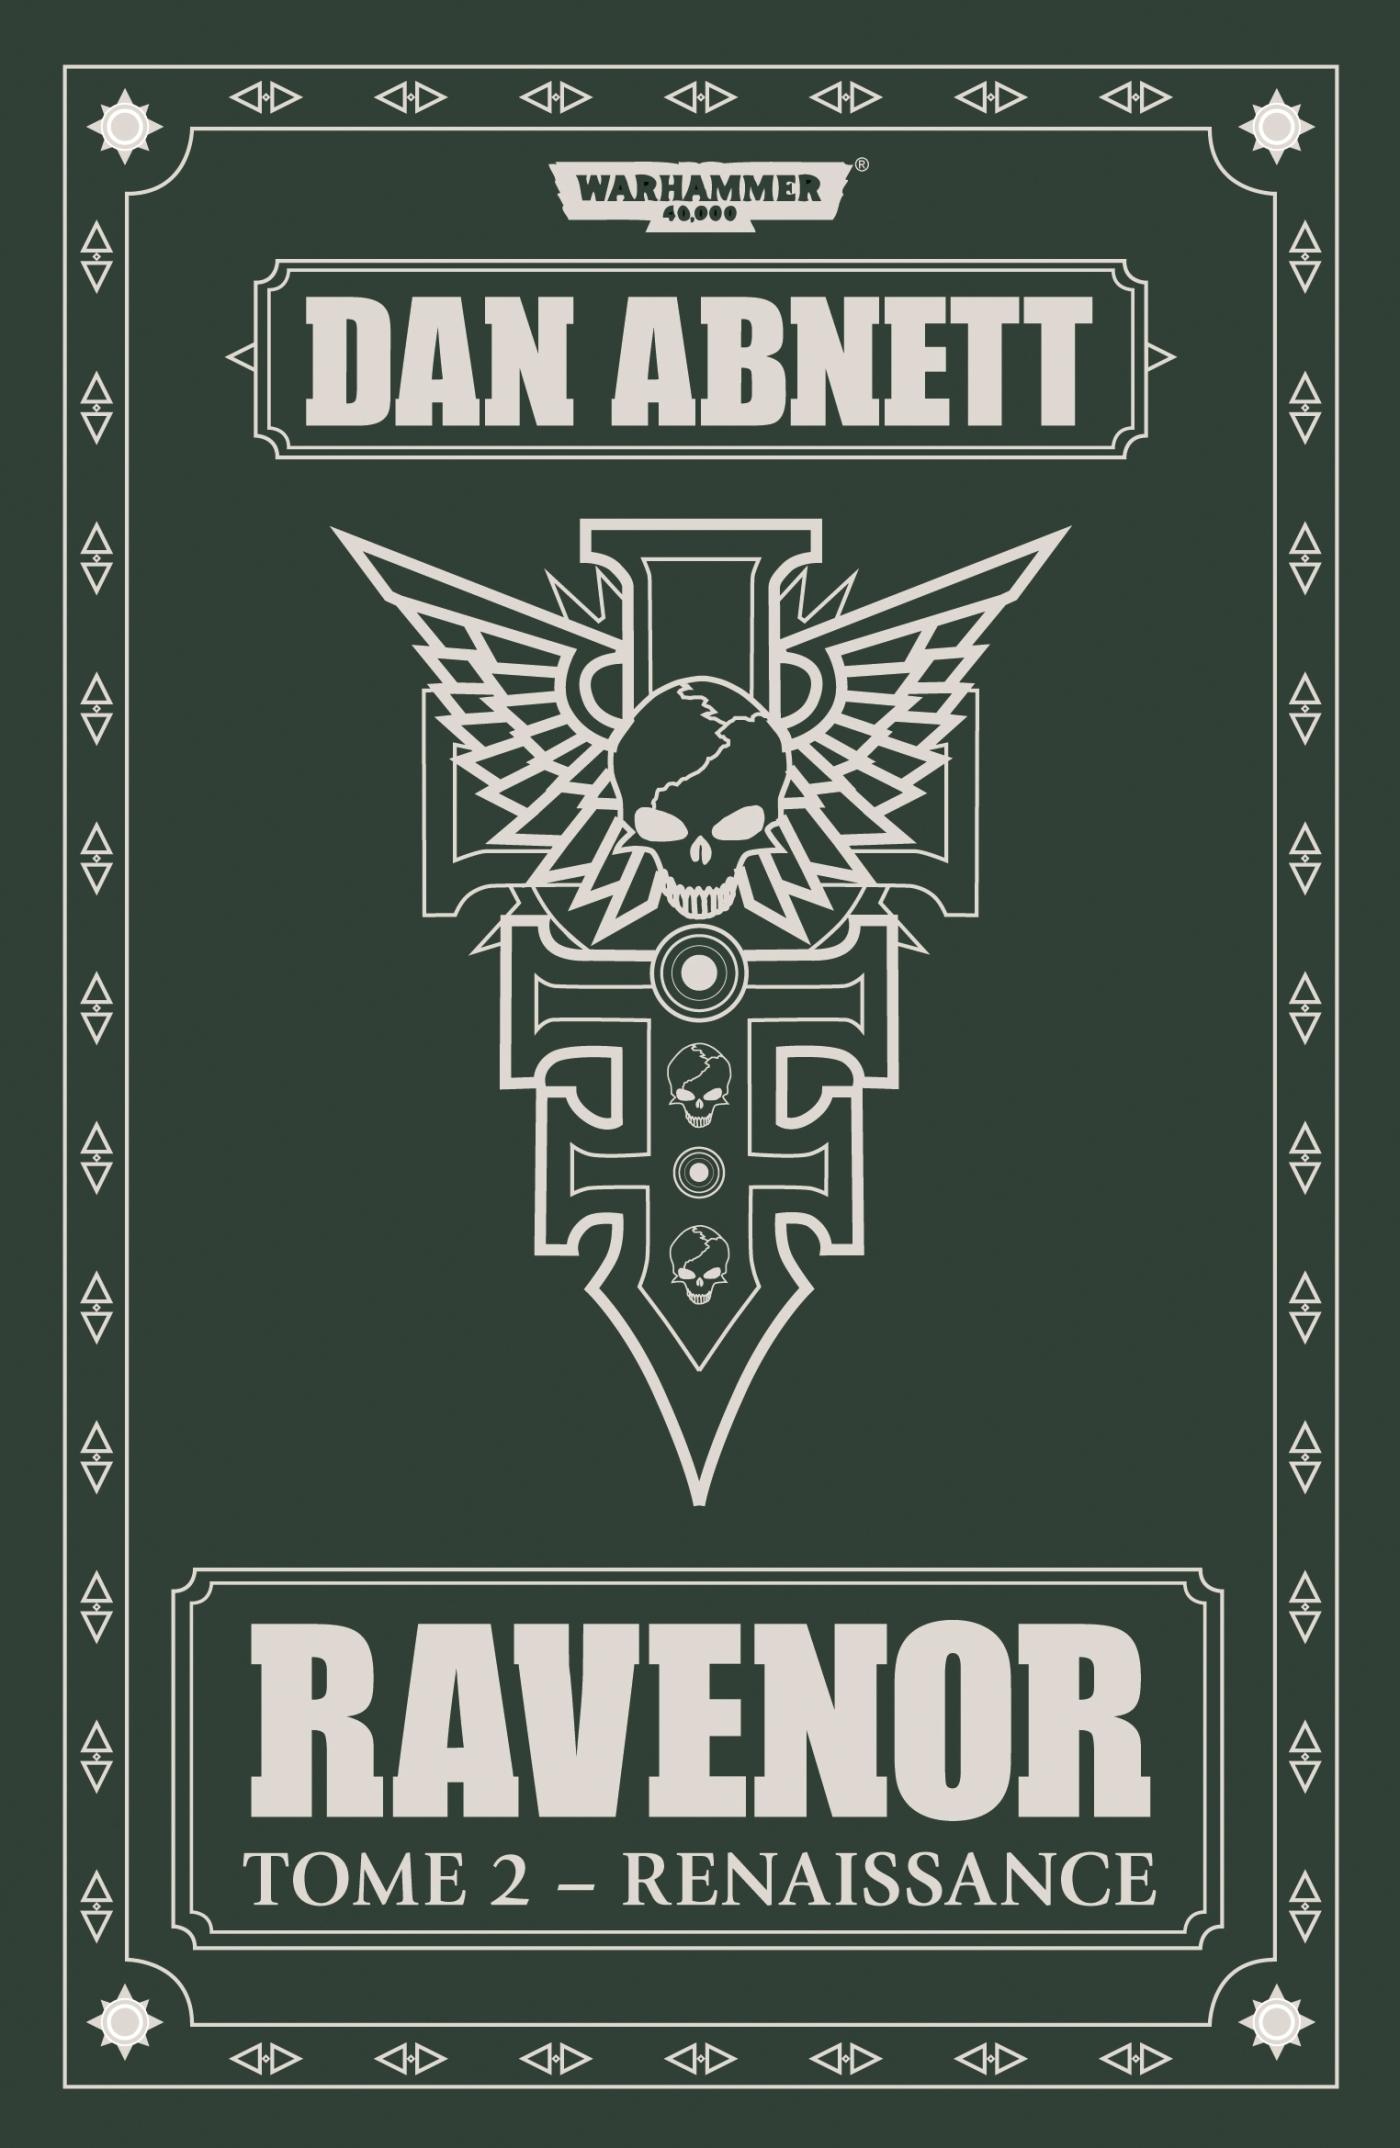 RAVENOR : RENAISSANCE - TOME 2